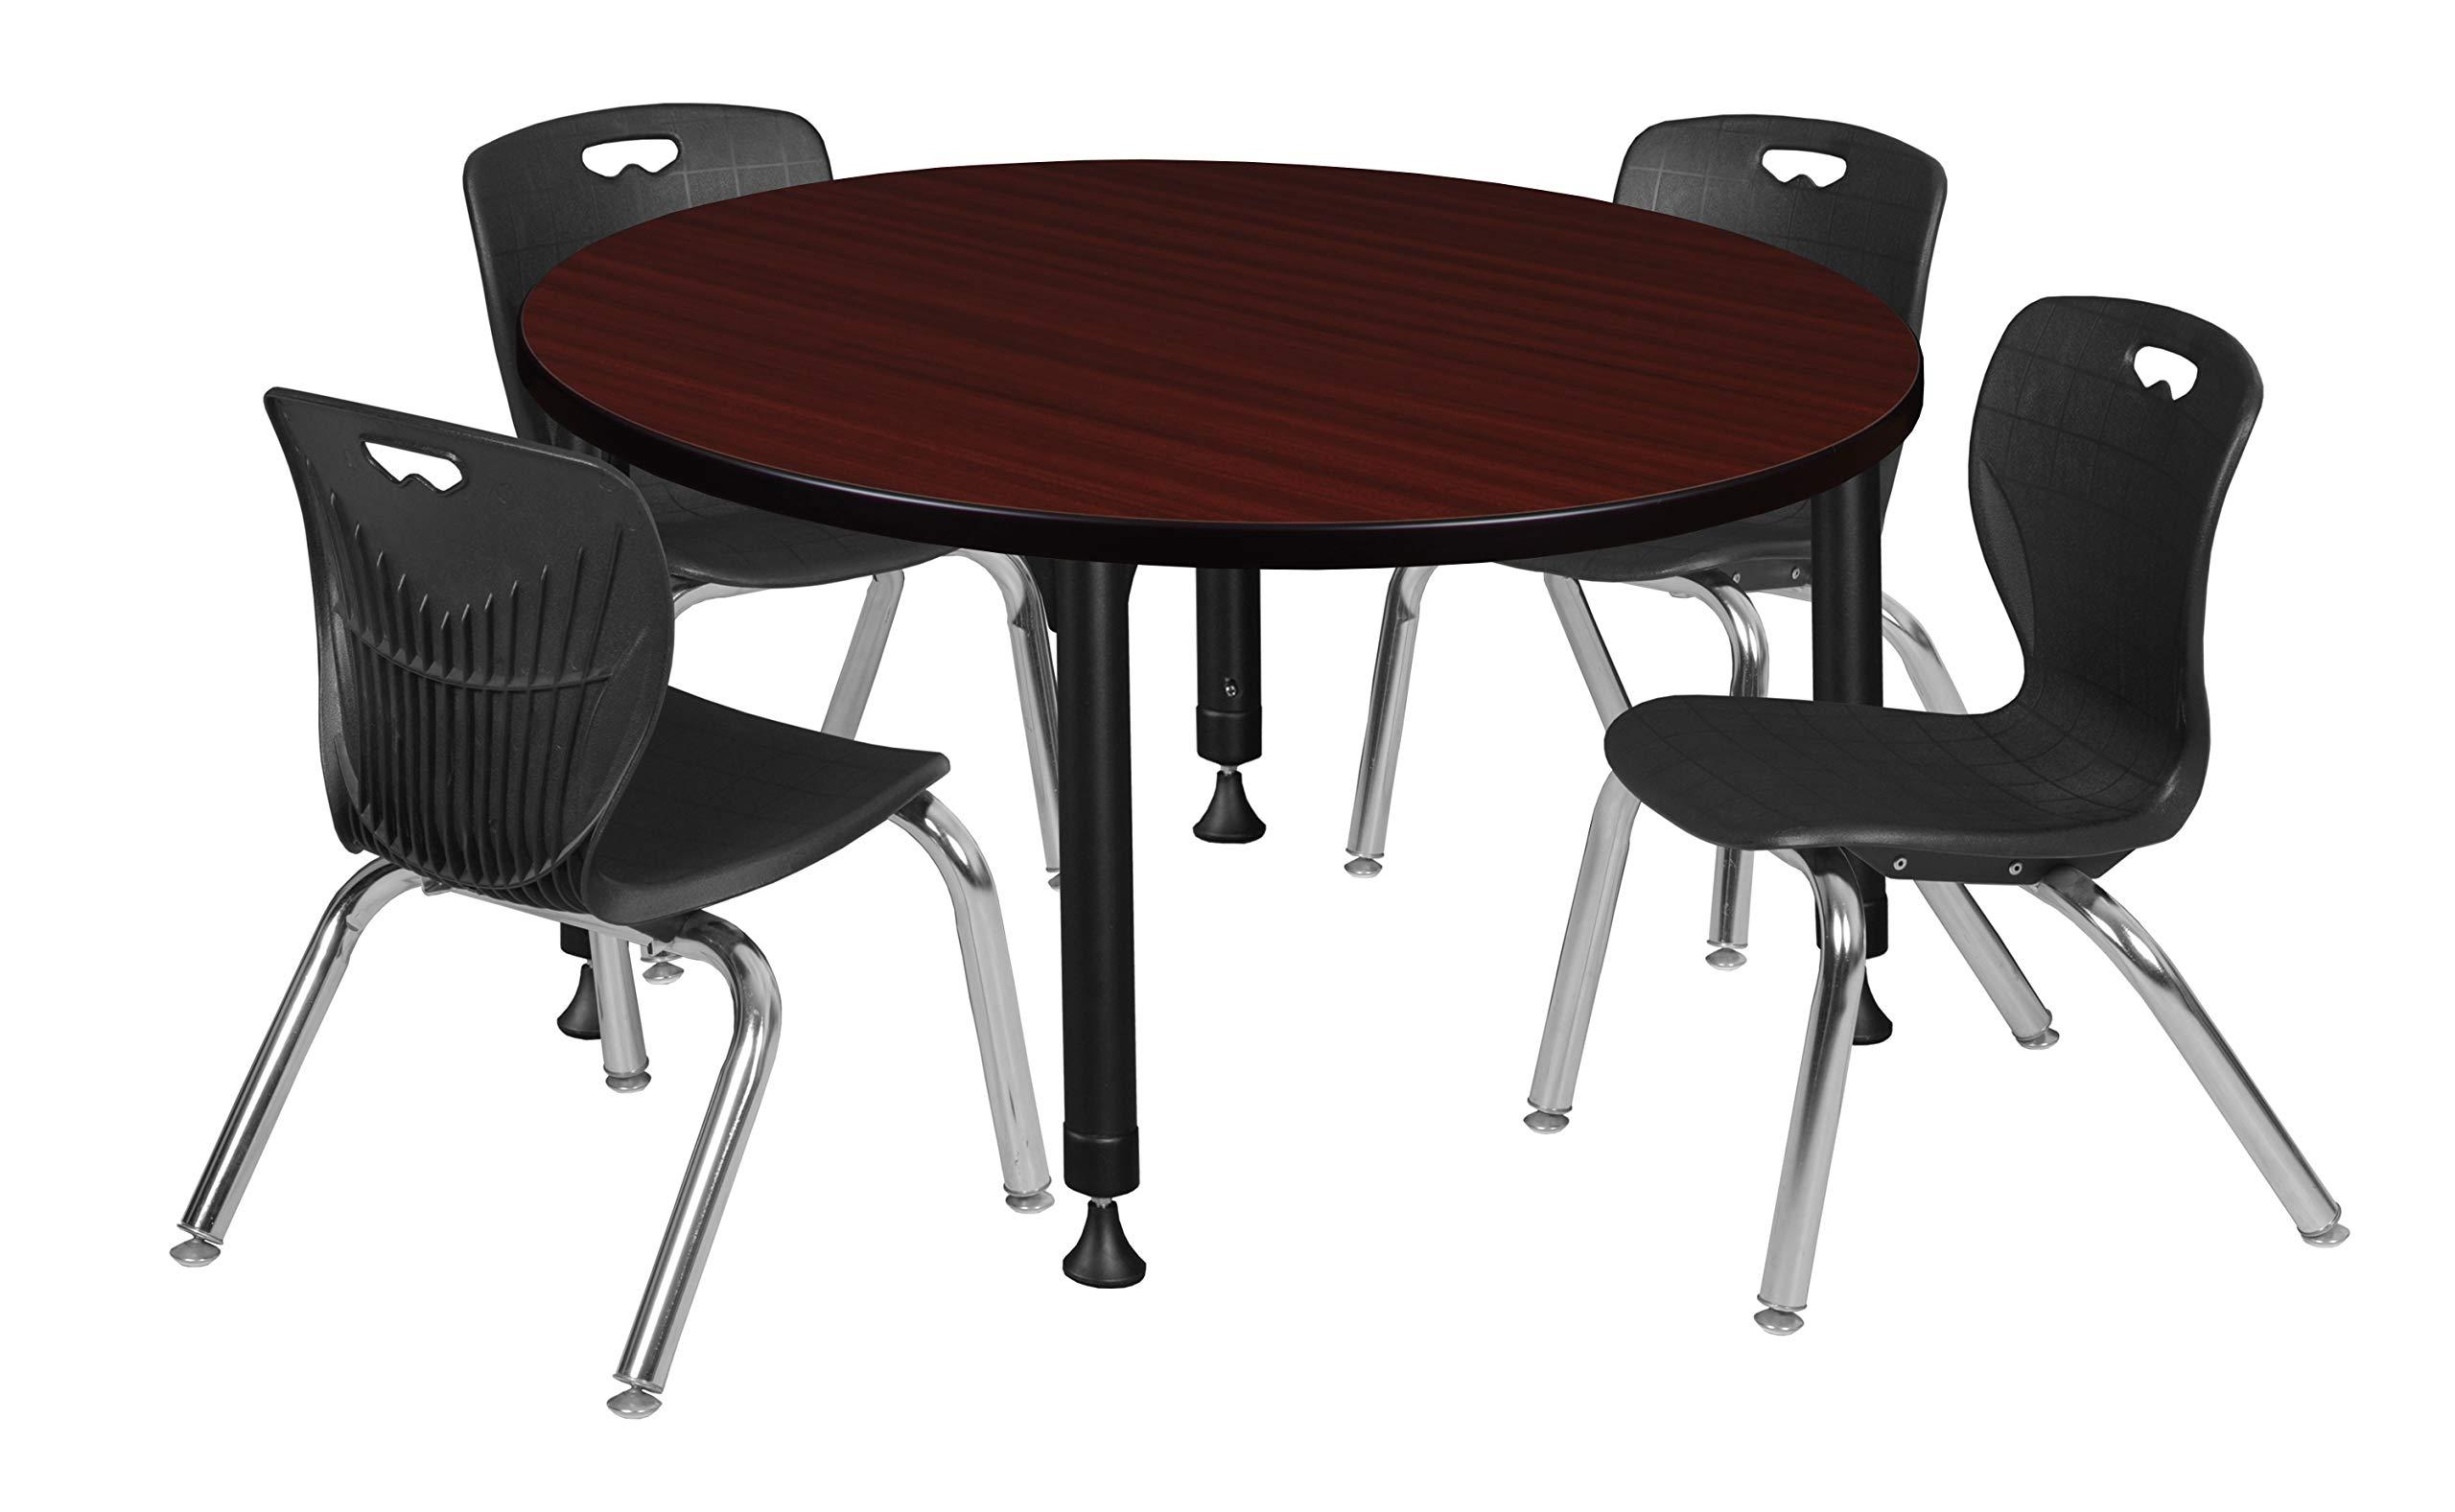 Regency TB42RNDMHAPBK45BK Kee Height Adjustable Classroom Table Set with Four 12'' Andy Chairs, 42'', Mahogany/Black